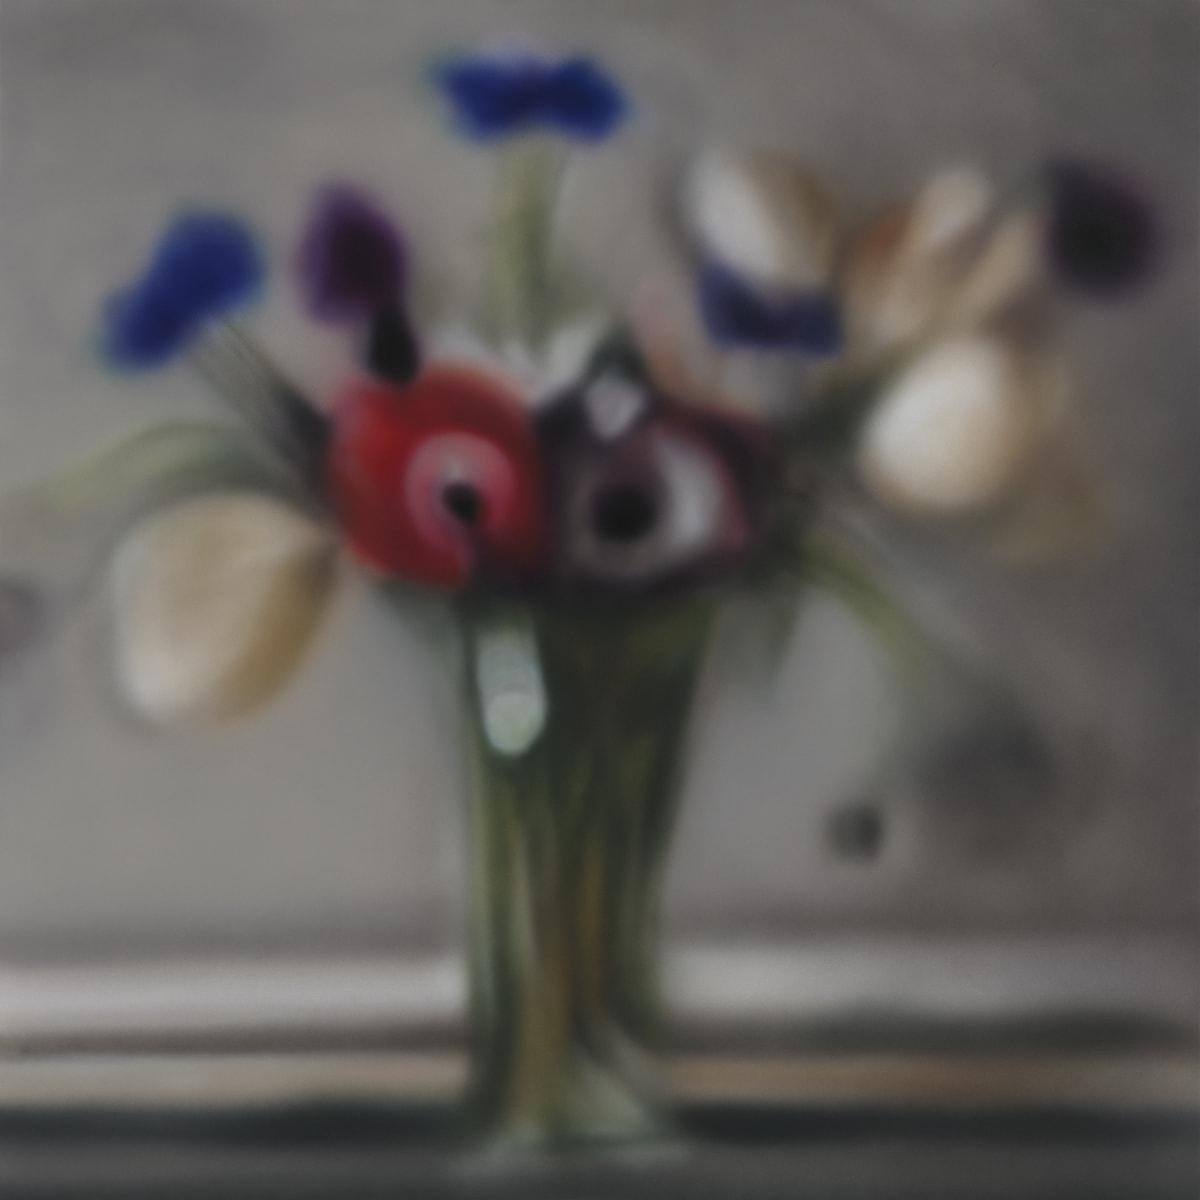 Anemones Blurry Acrylic on polyester 99 x 99 cm